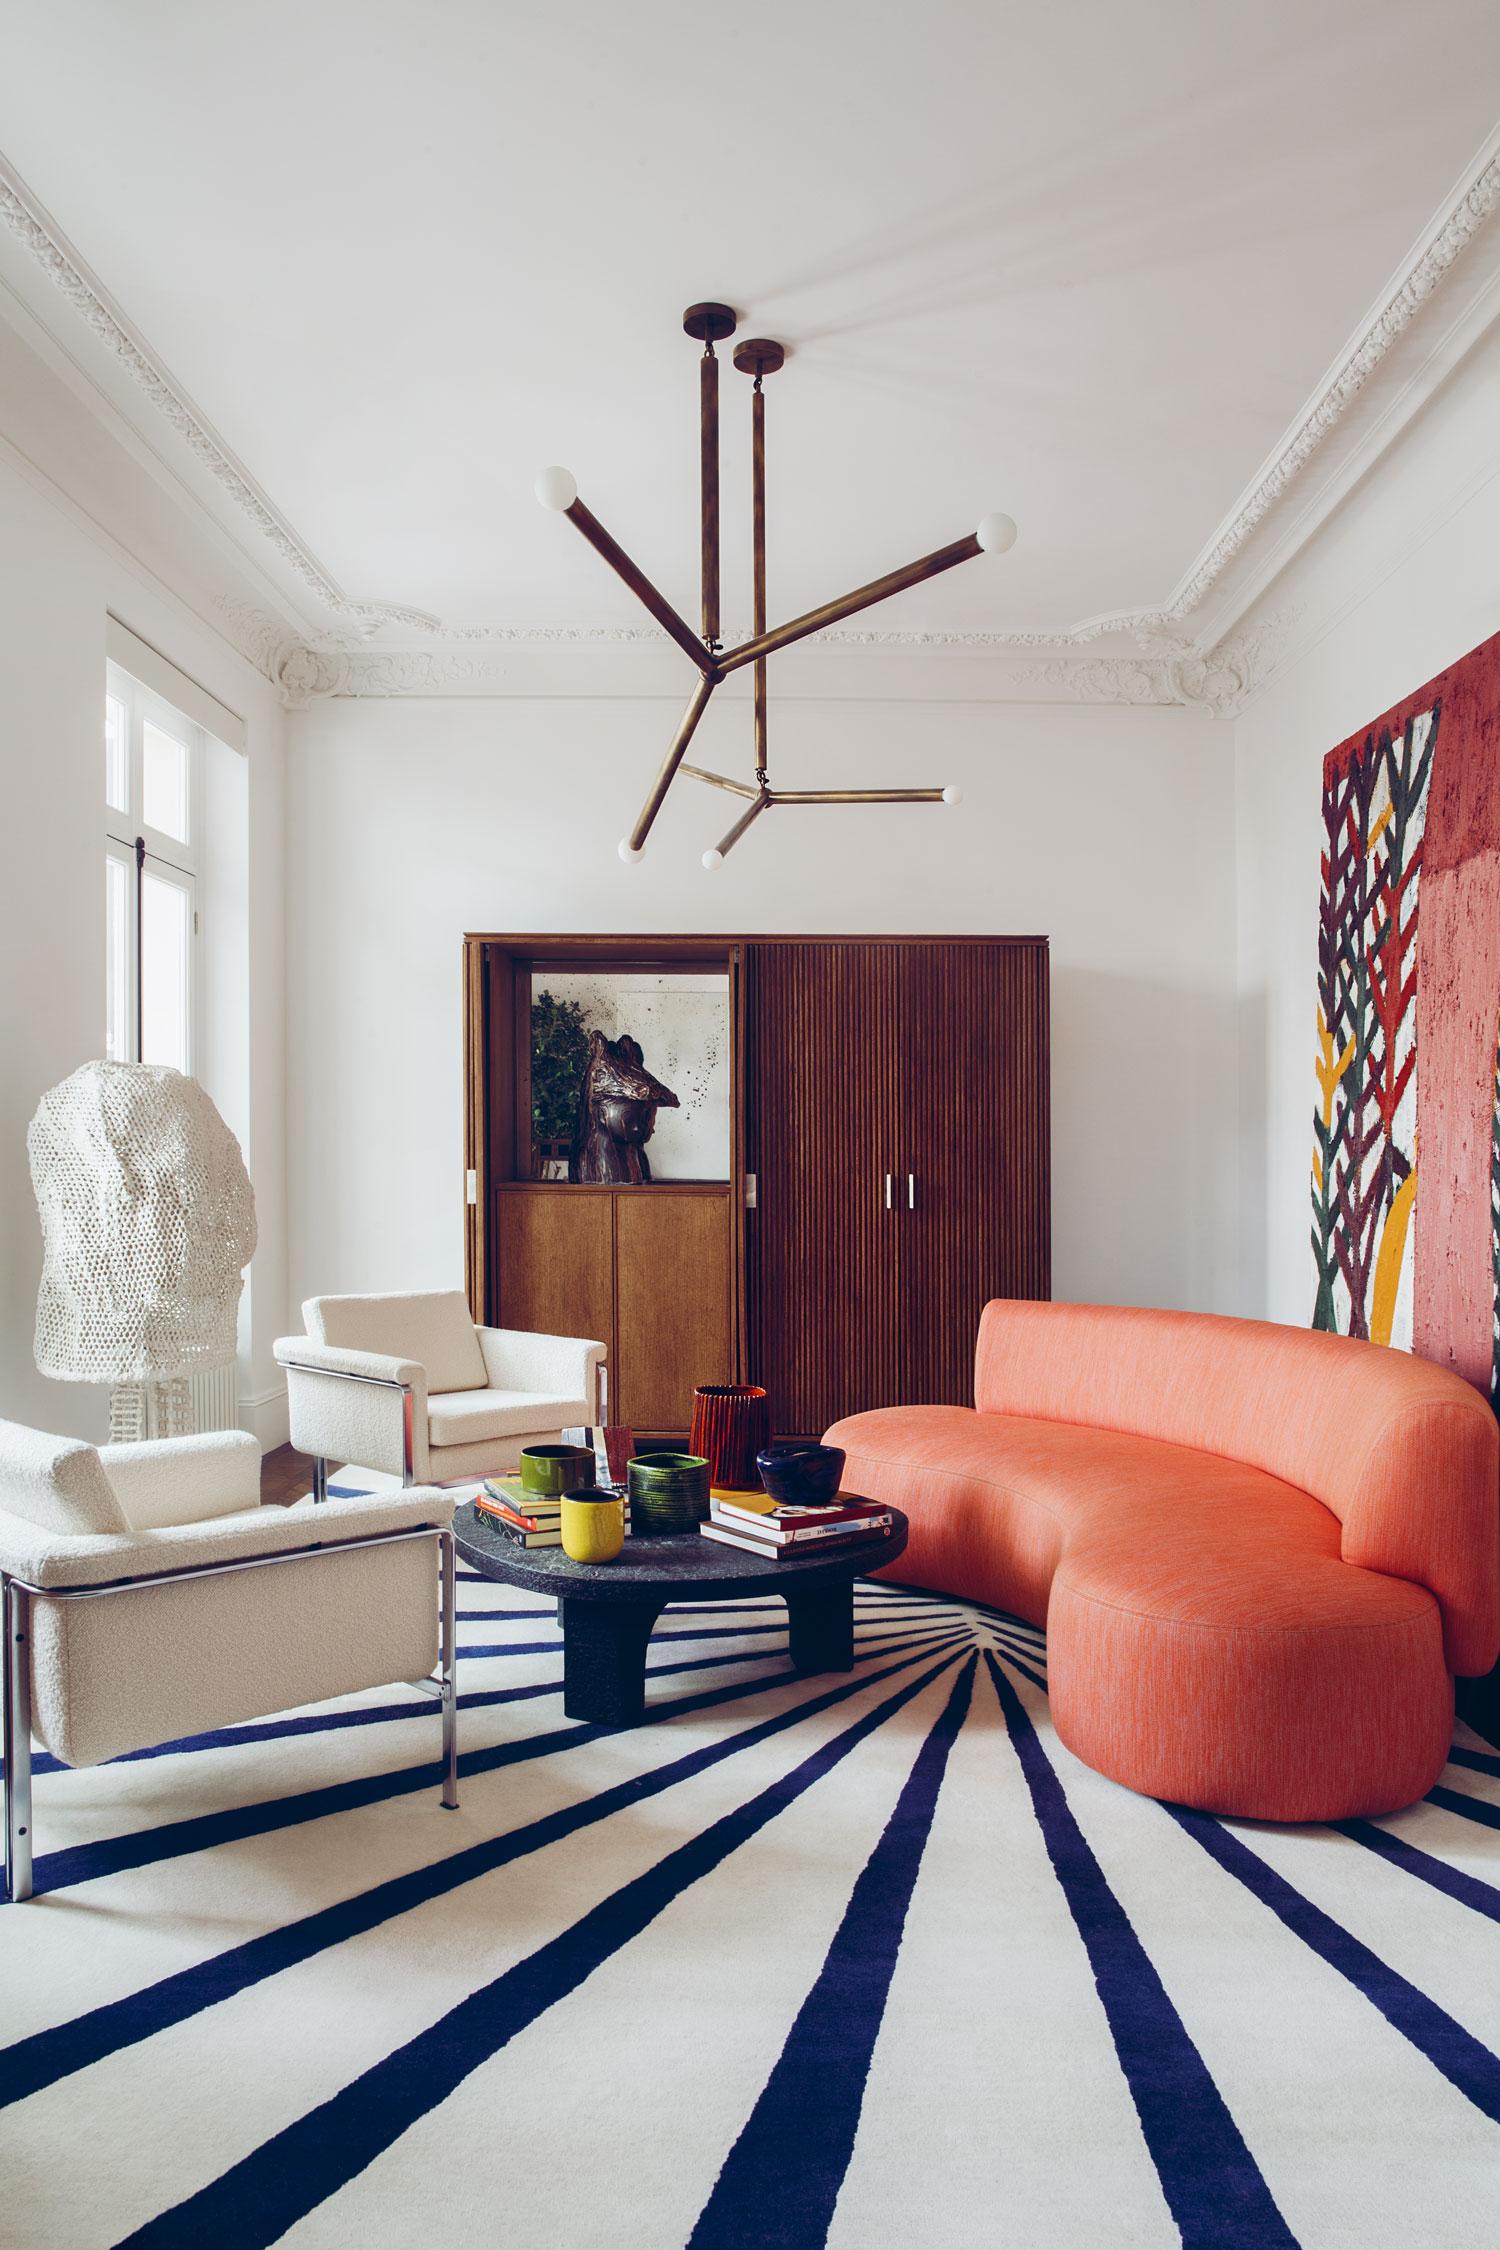 RMGB, Rue Des Reservoirs, Paris Apartment Renovation, Photo Matthieu Salvaing | Yellowtrace